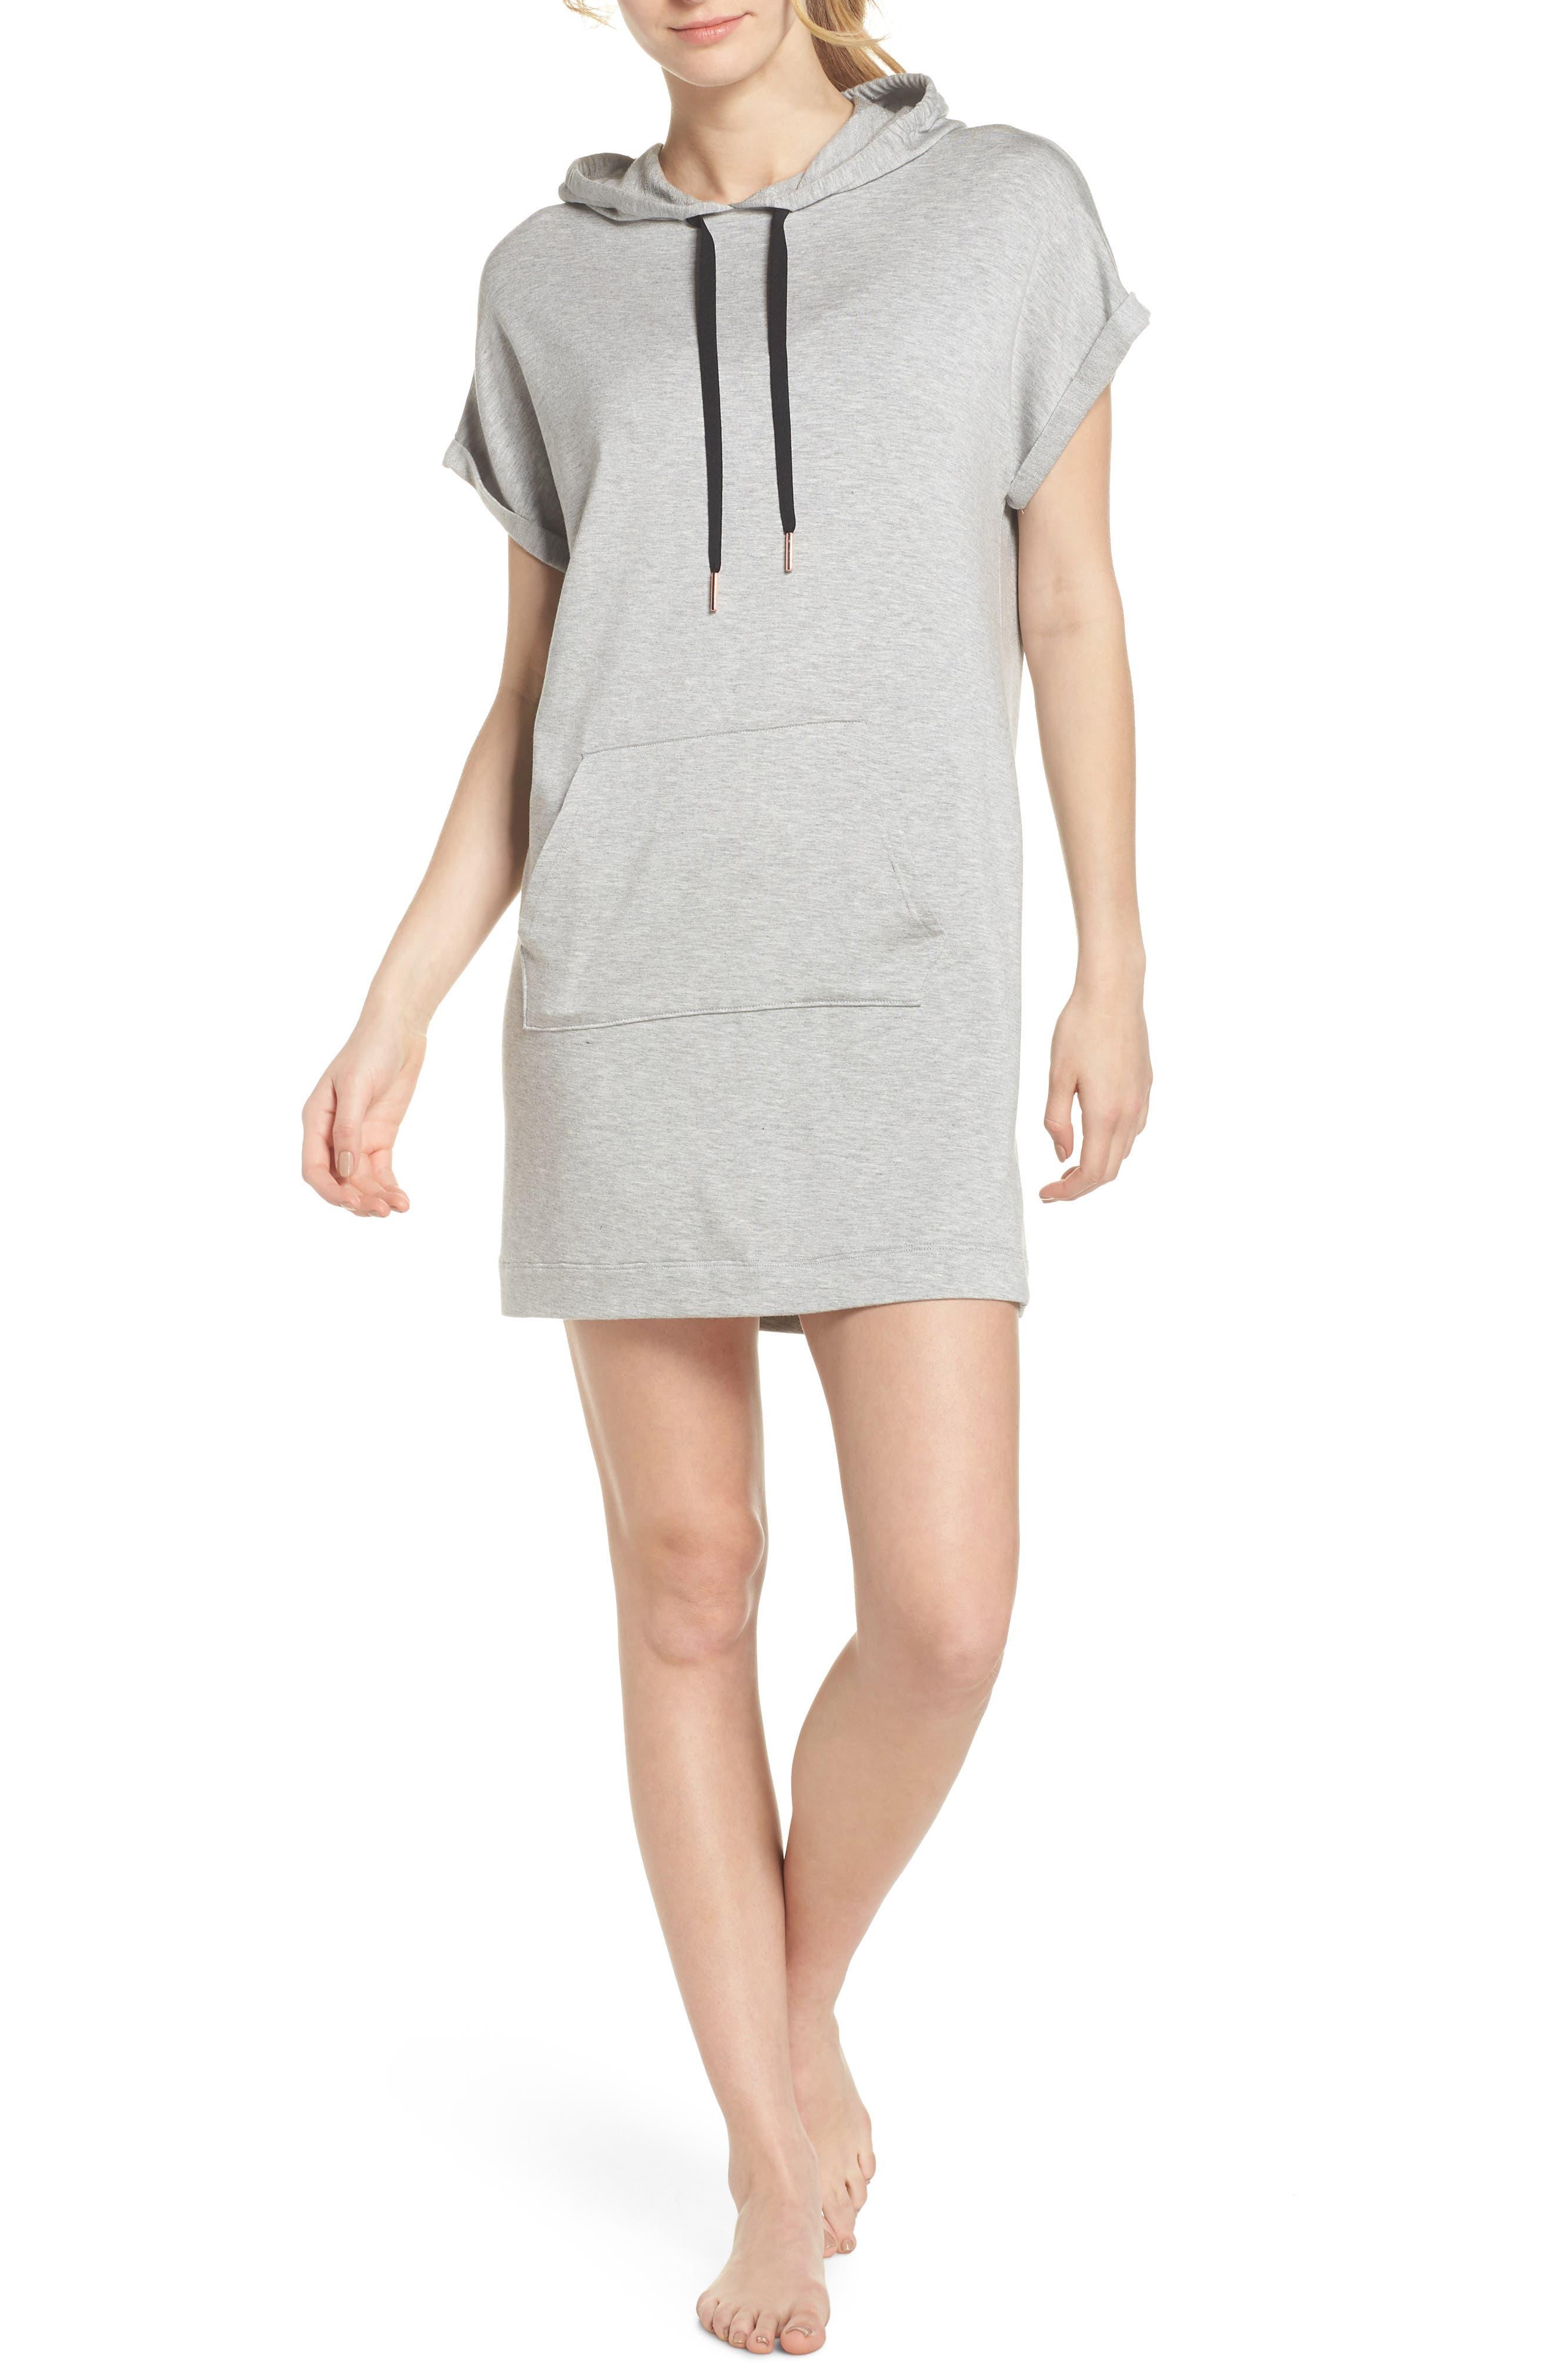 It's All Hoodie Hooded Sweatshirt Dress,                             Main thumbnail 1, color,                             LIGHT HEATHER GRAY